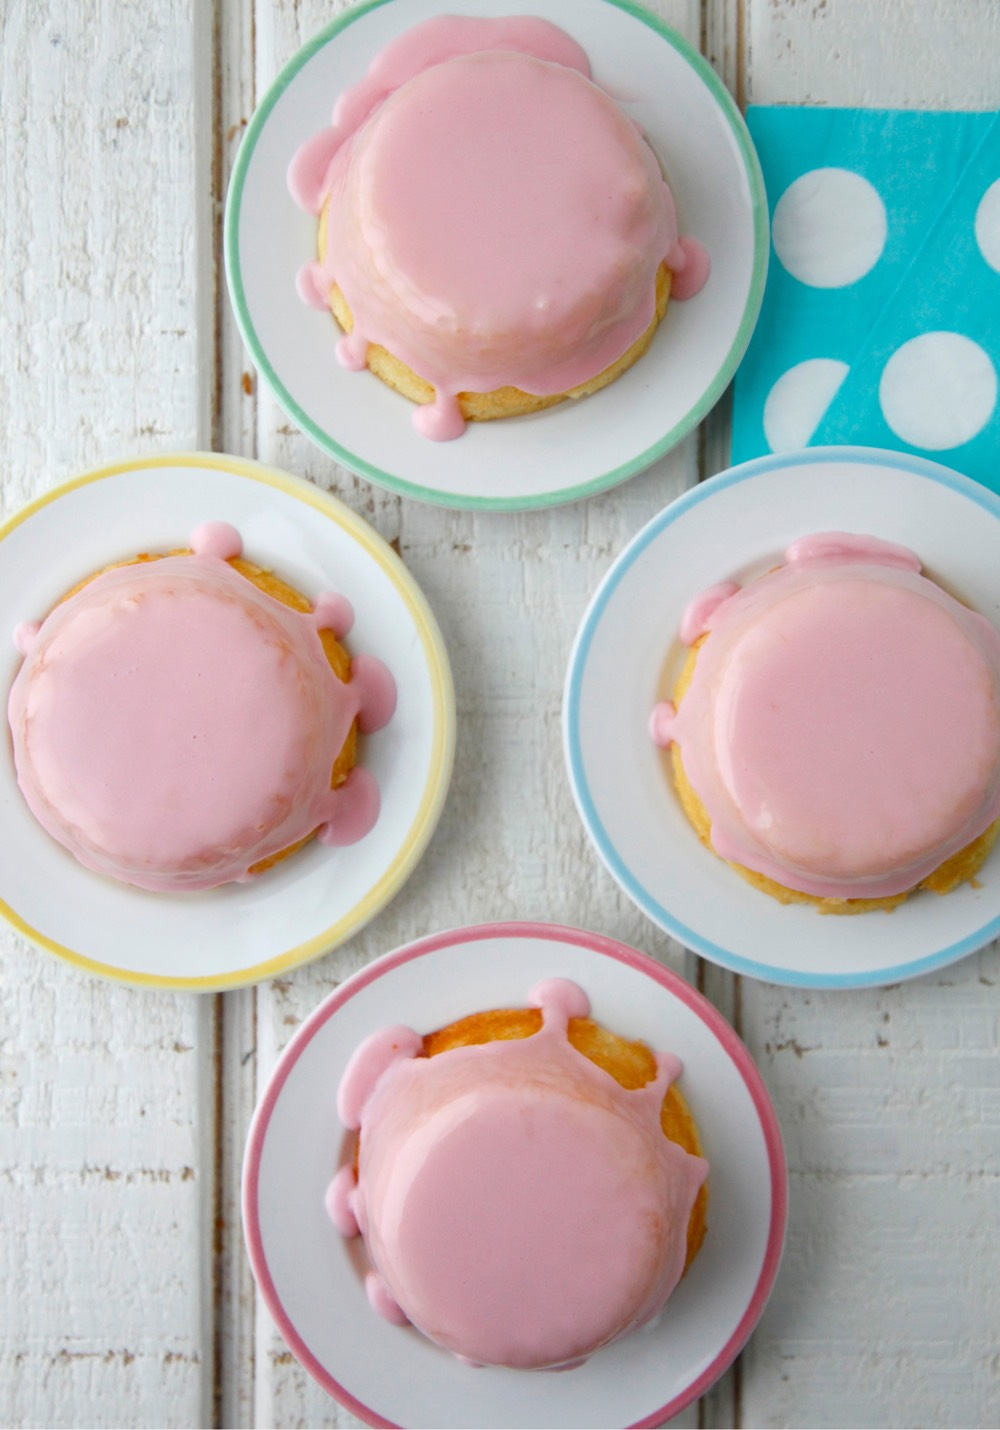 Meyer Lemon Tea Cakes with Pomegranate Glaze from Weelicious